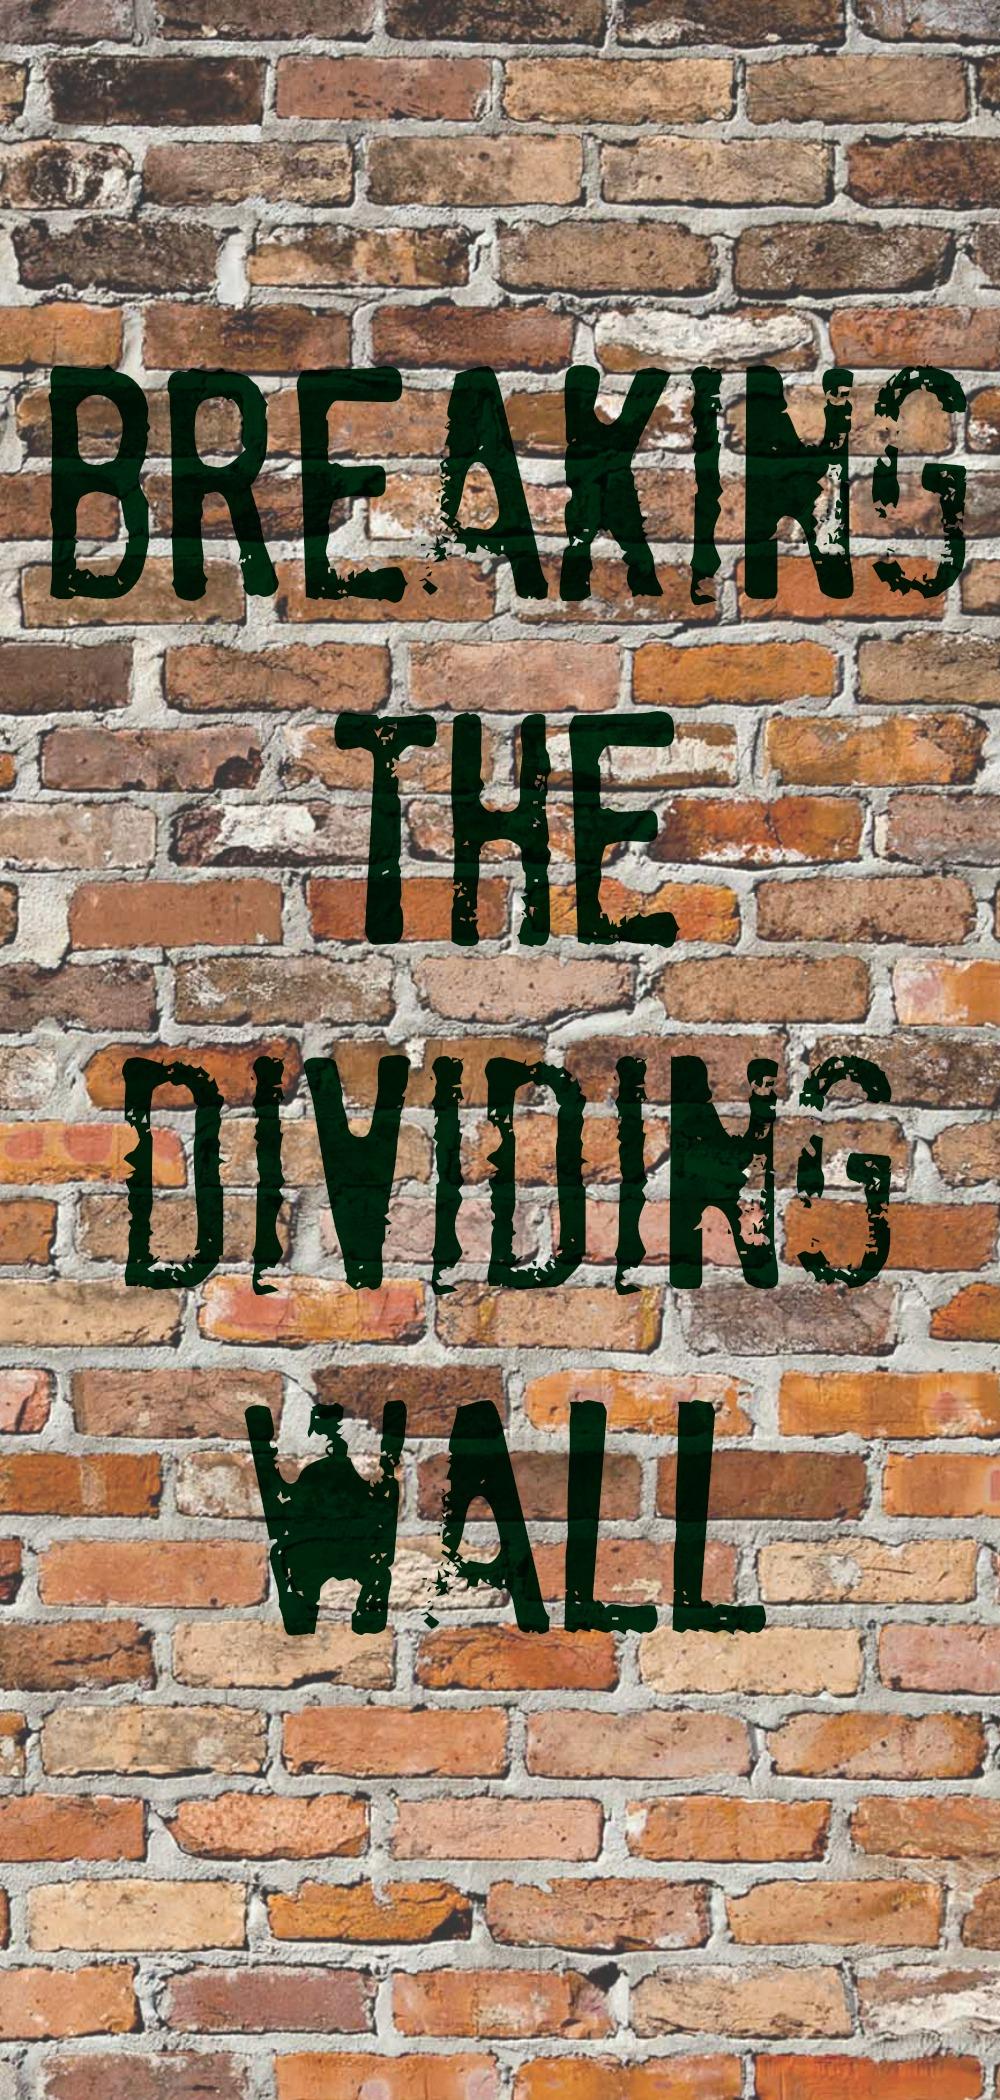 Image result for walls dividing people